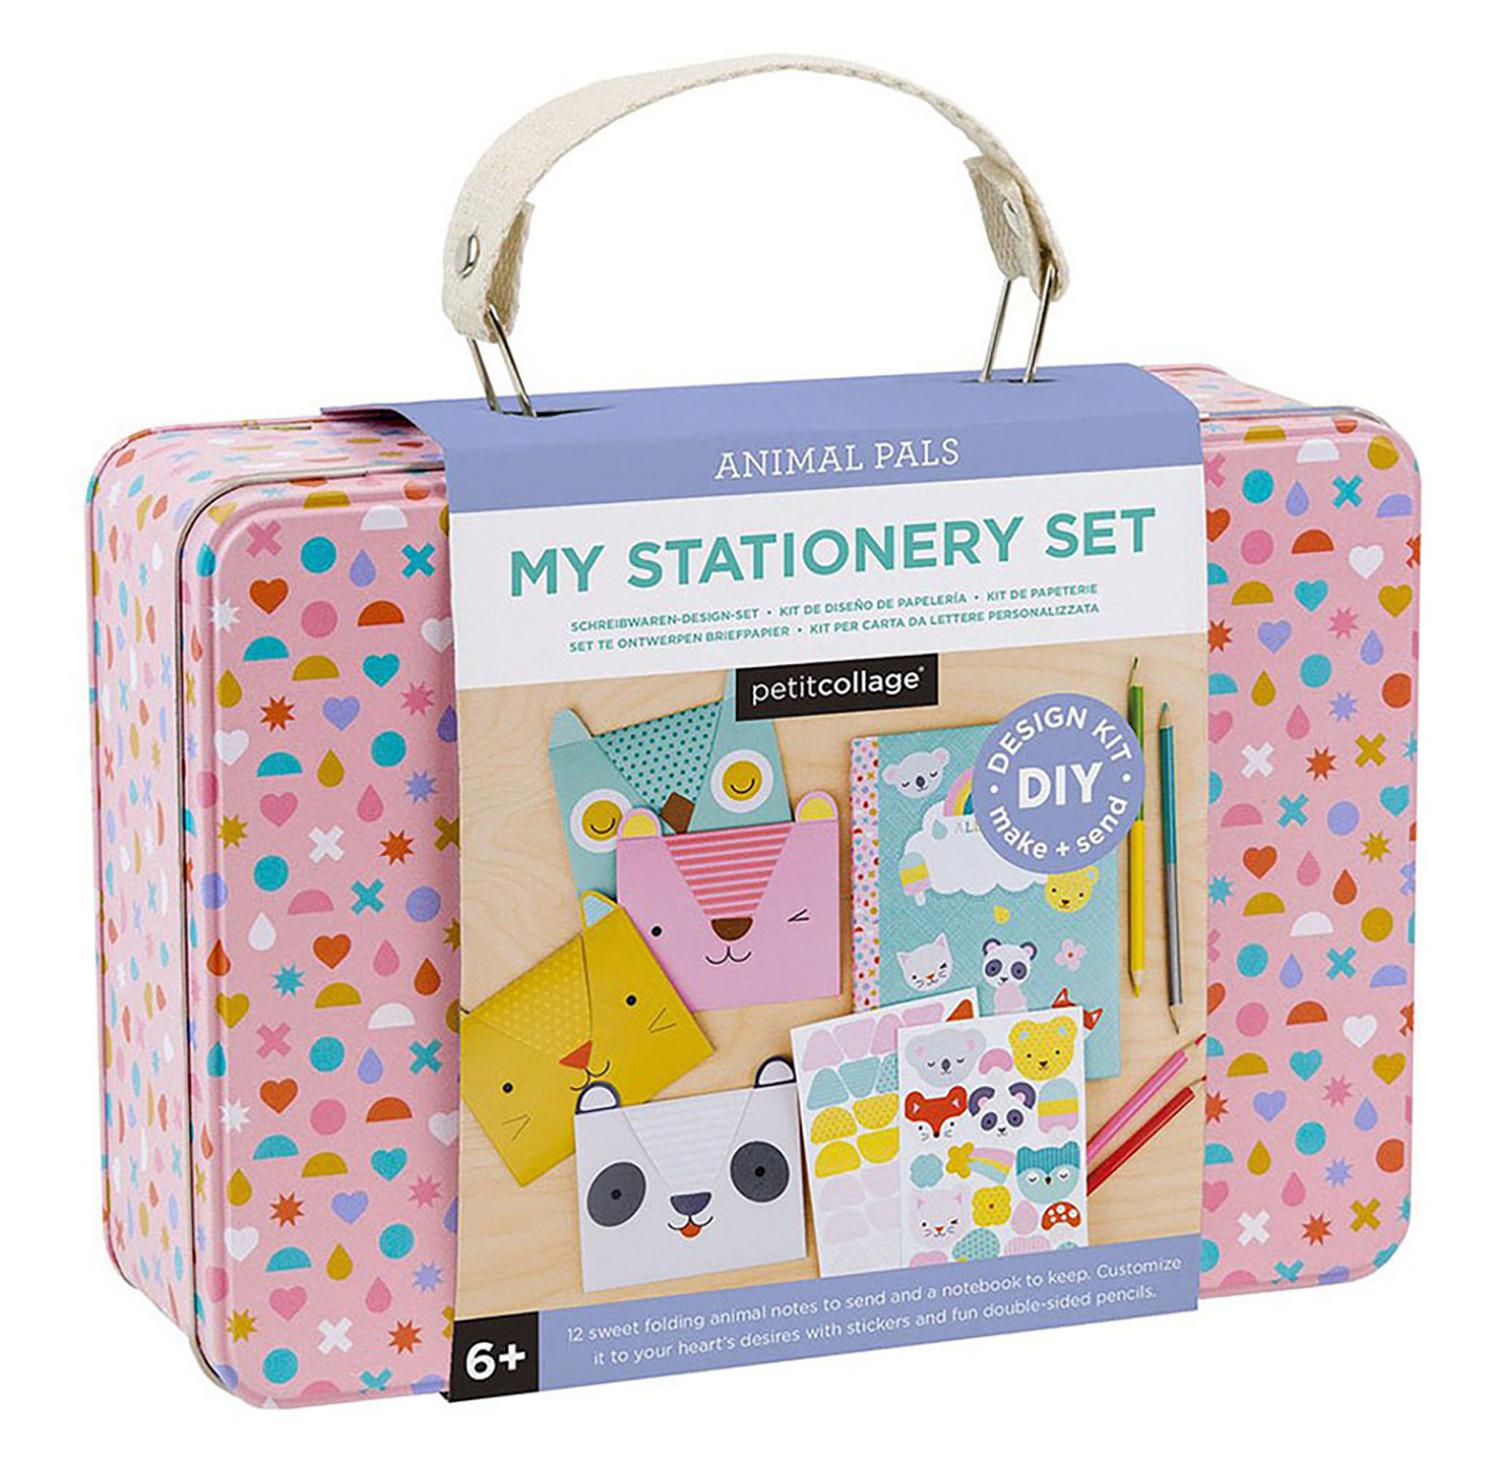 Petit Collage – My Stationery Set Animal Pals DIY Kit